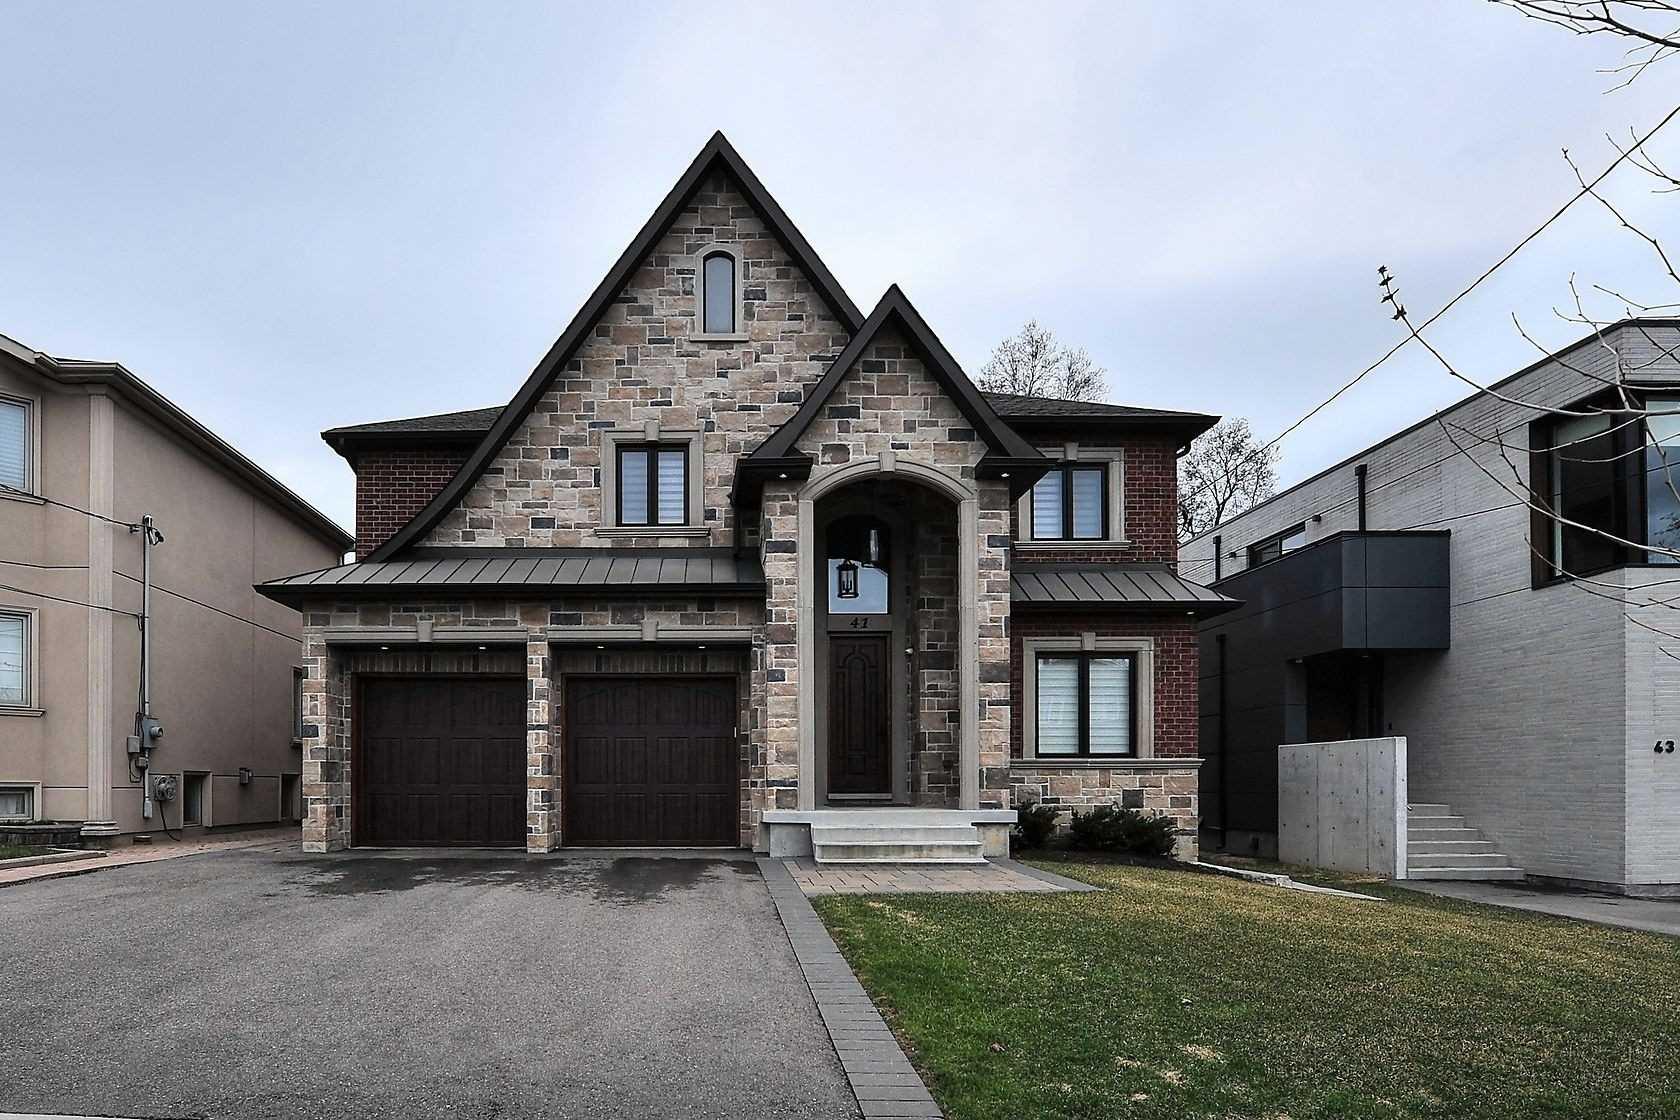 41 Grovedale Ave, Toronto, Ontario M6L1Y5, 4 Bedrooms Bedrooms, 8 Rooms Rooms,4 BathroomsBathrooms,Detached,For Sale,Grovedale,W5372448